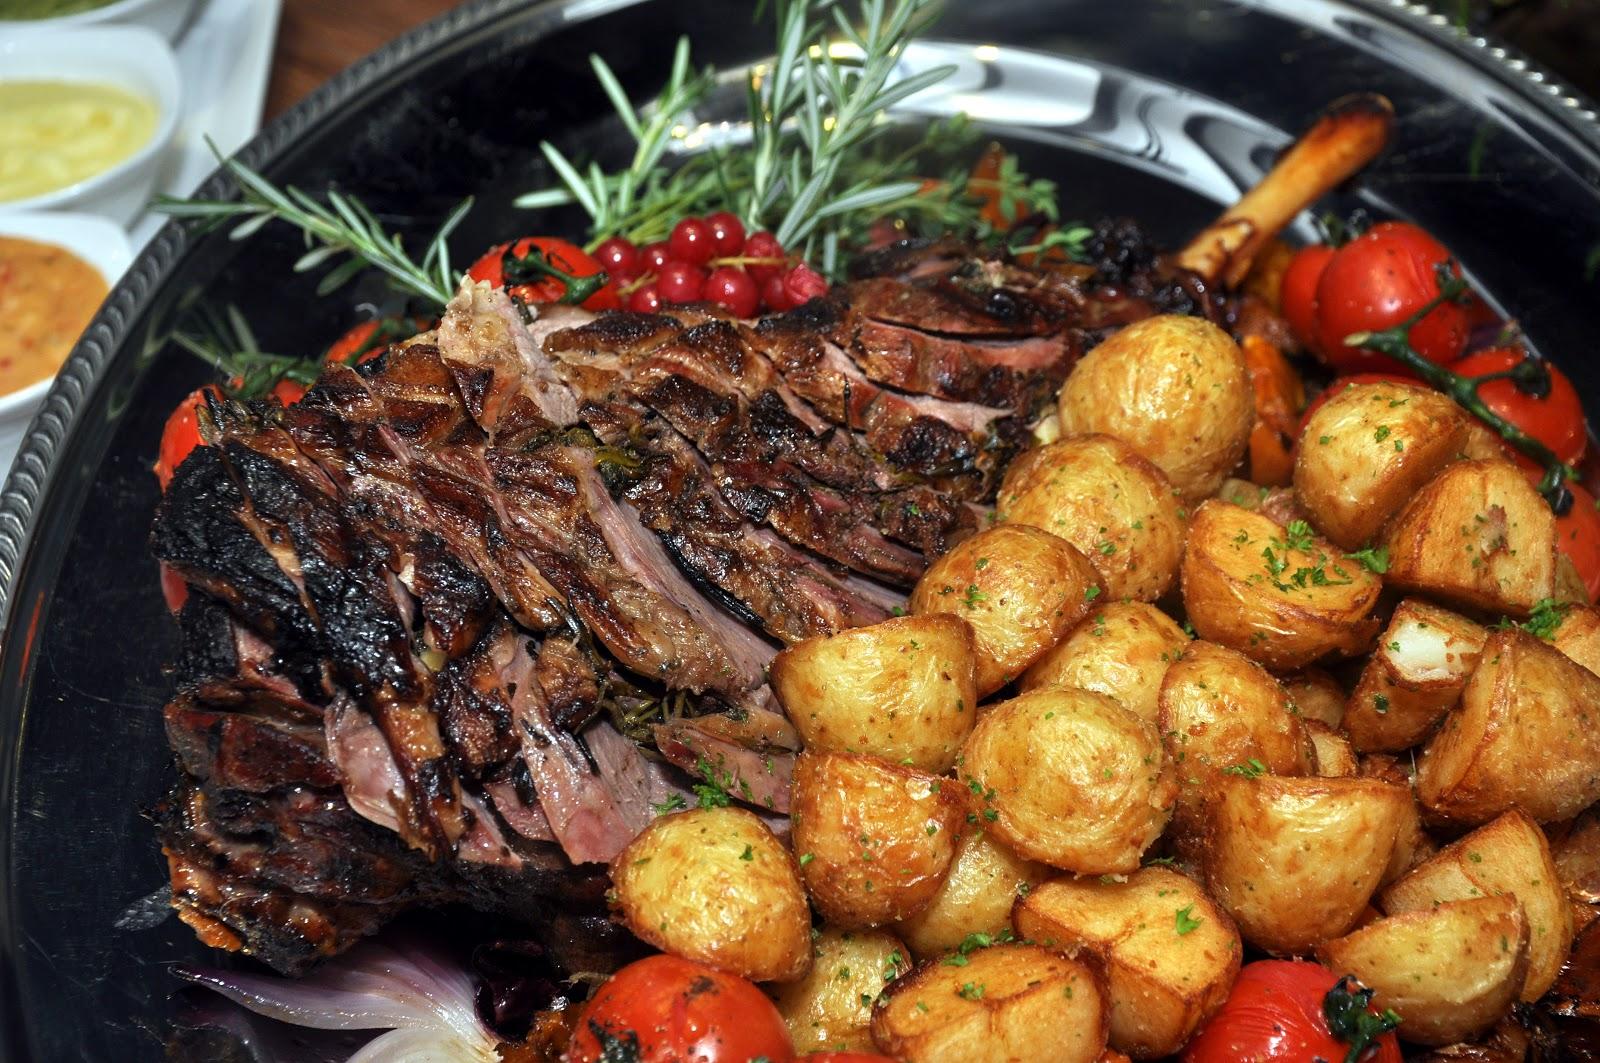 roasted+honey+mustard+Australian+leg+of+lamb.jpg (1600×1063) | Food ...